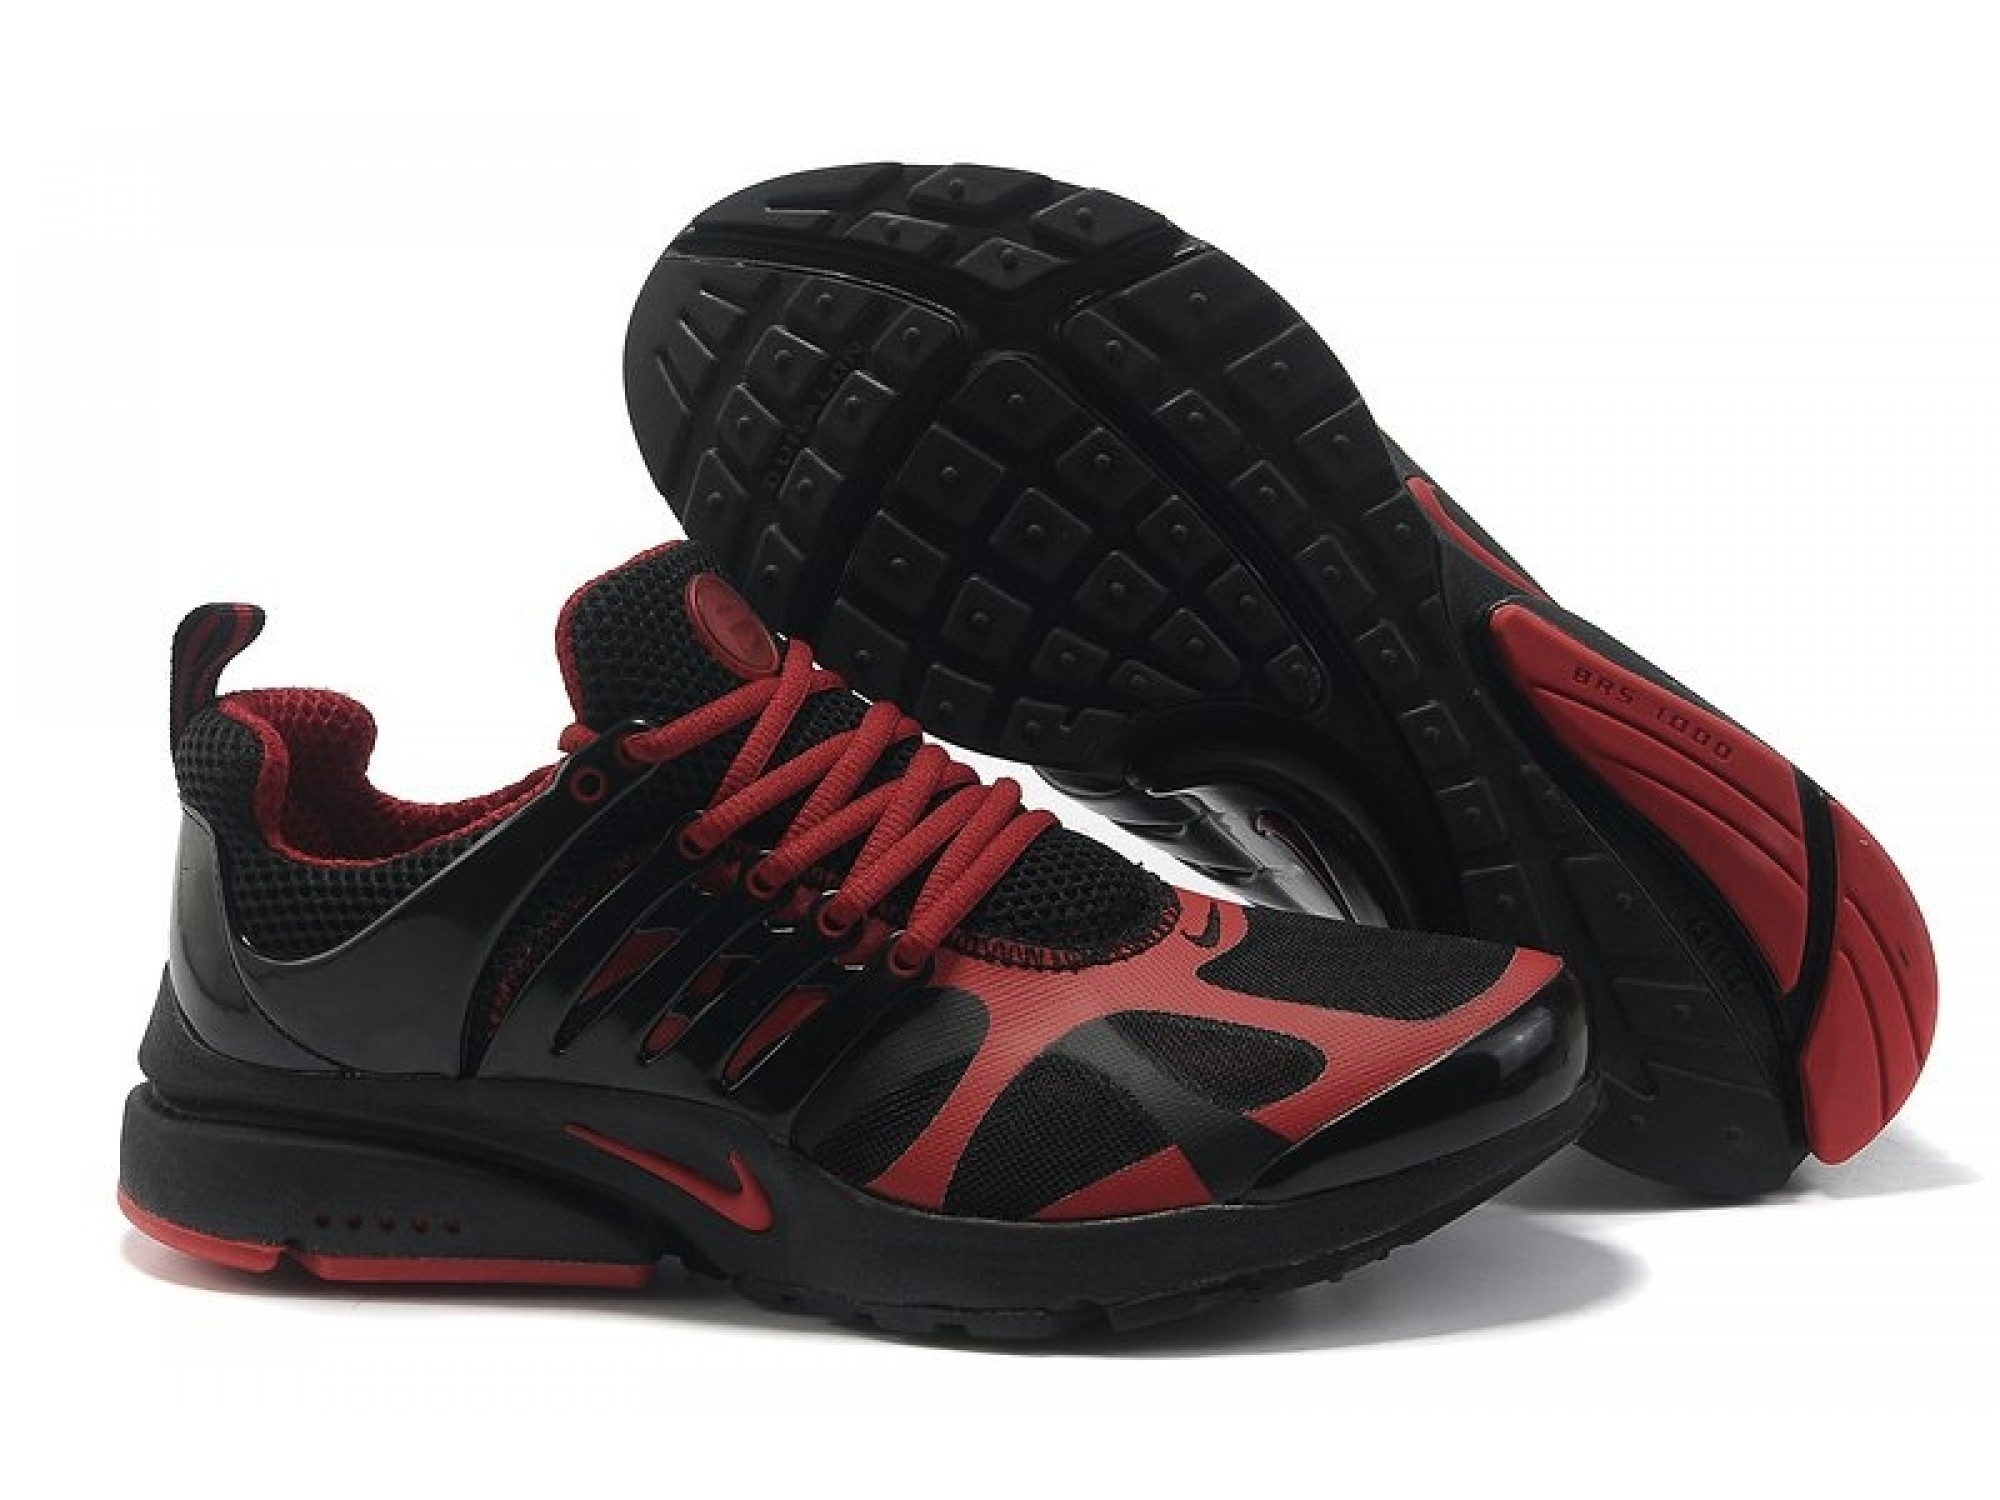 66c52b2b05e45b Nike Air Presto (Black/ Red) Беговые кроссовки купить в Украине ...